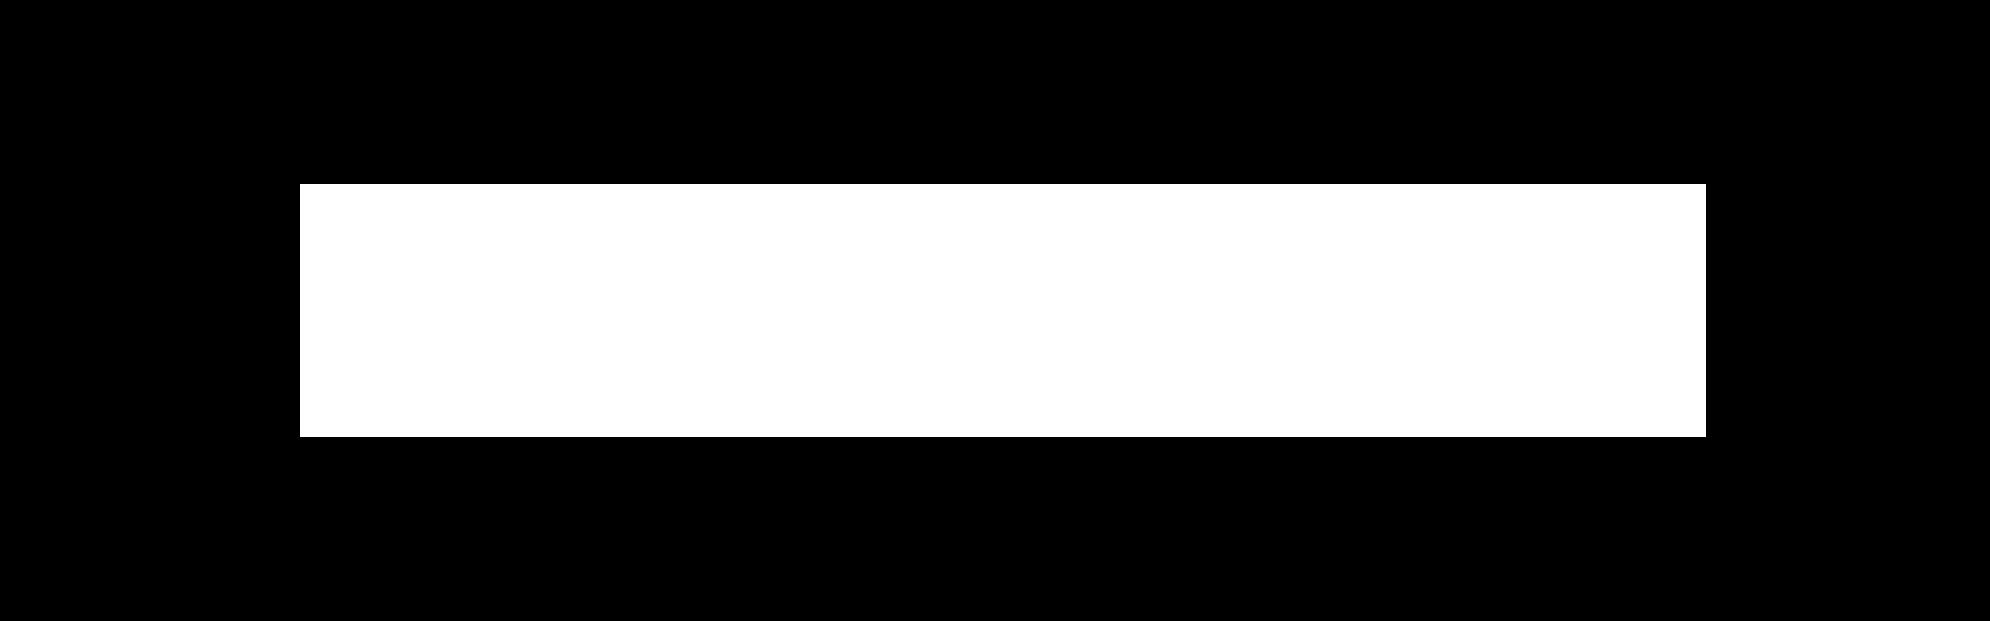 ufdesigners_logo